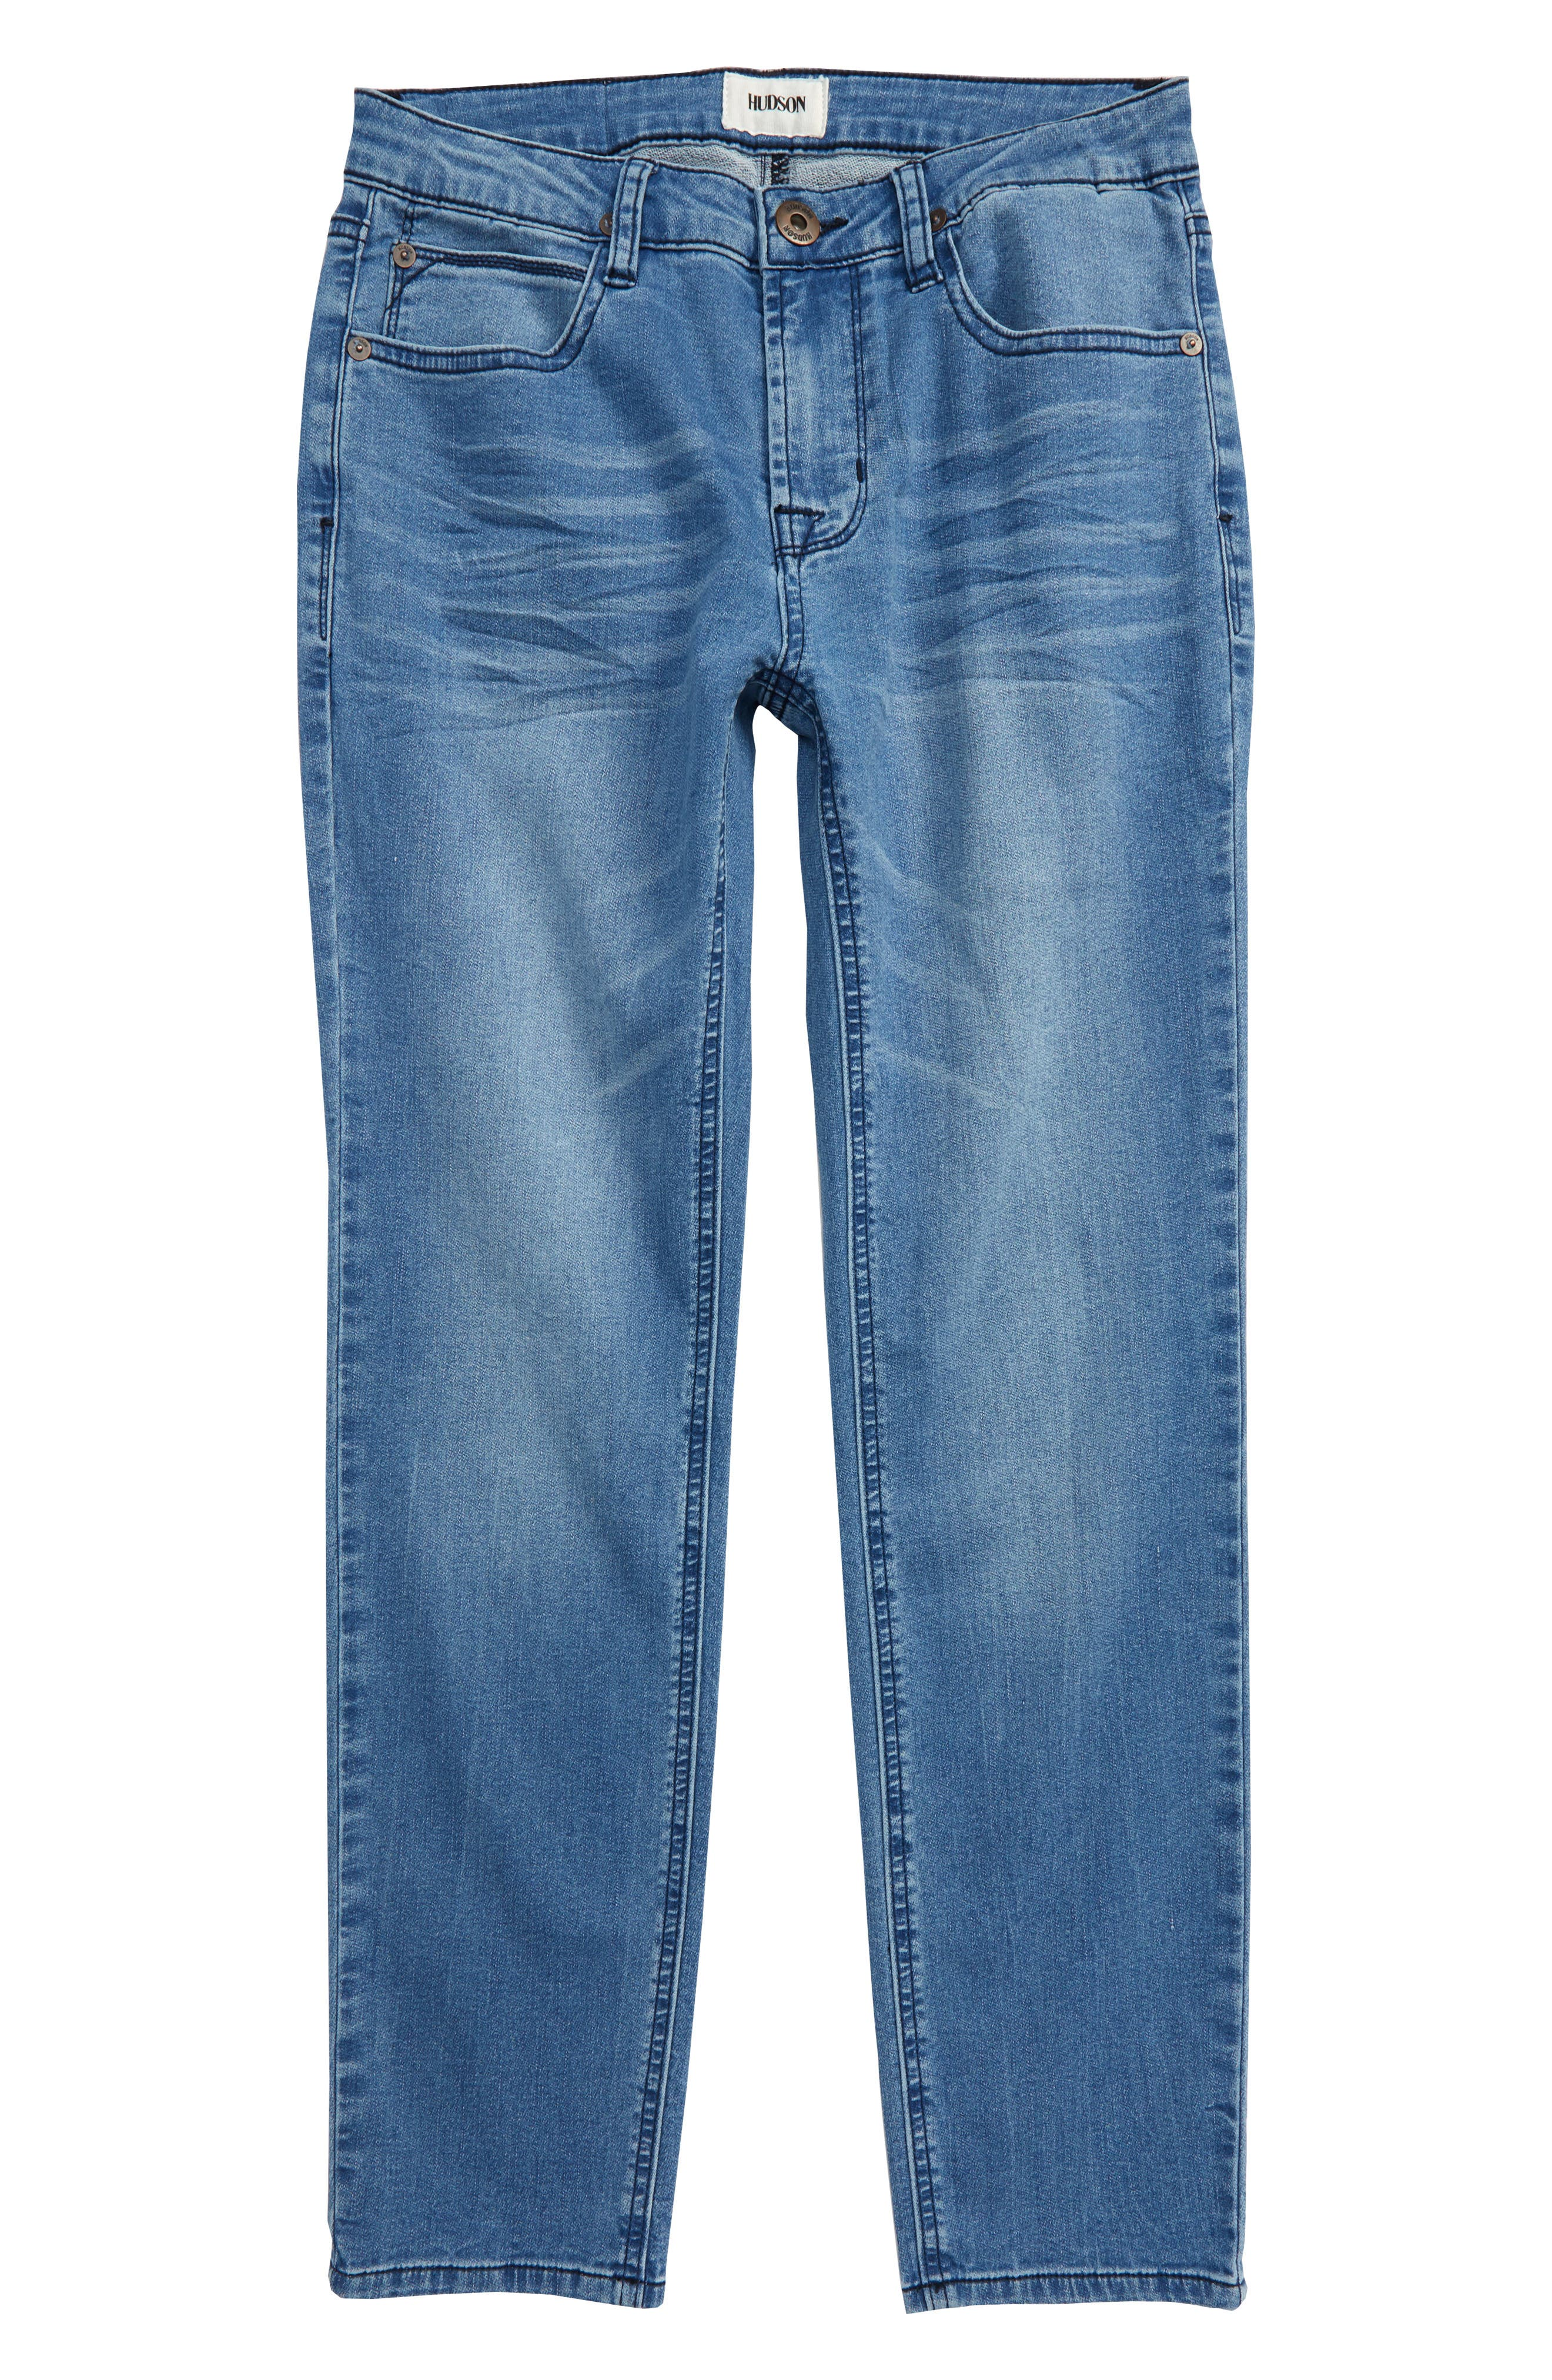 Boys Hudson Jeans Jagger Slim Straight Leg Jeans Size 16  Blue